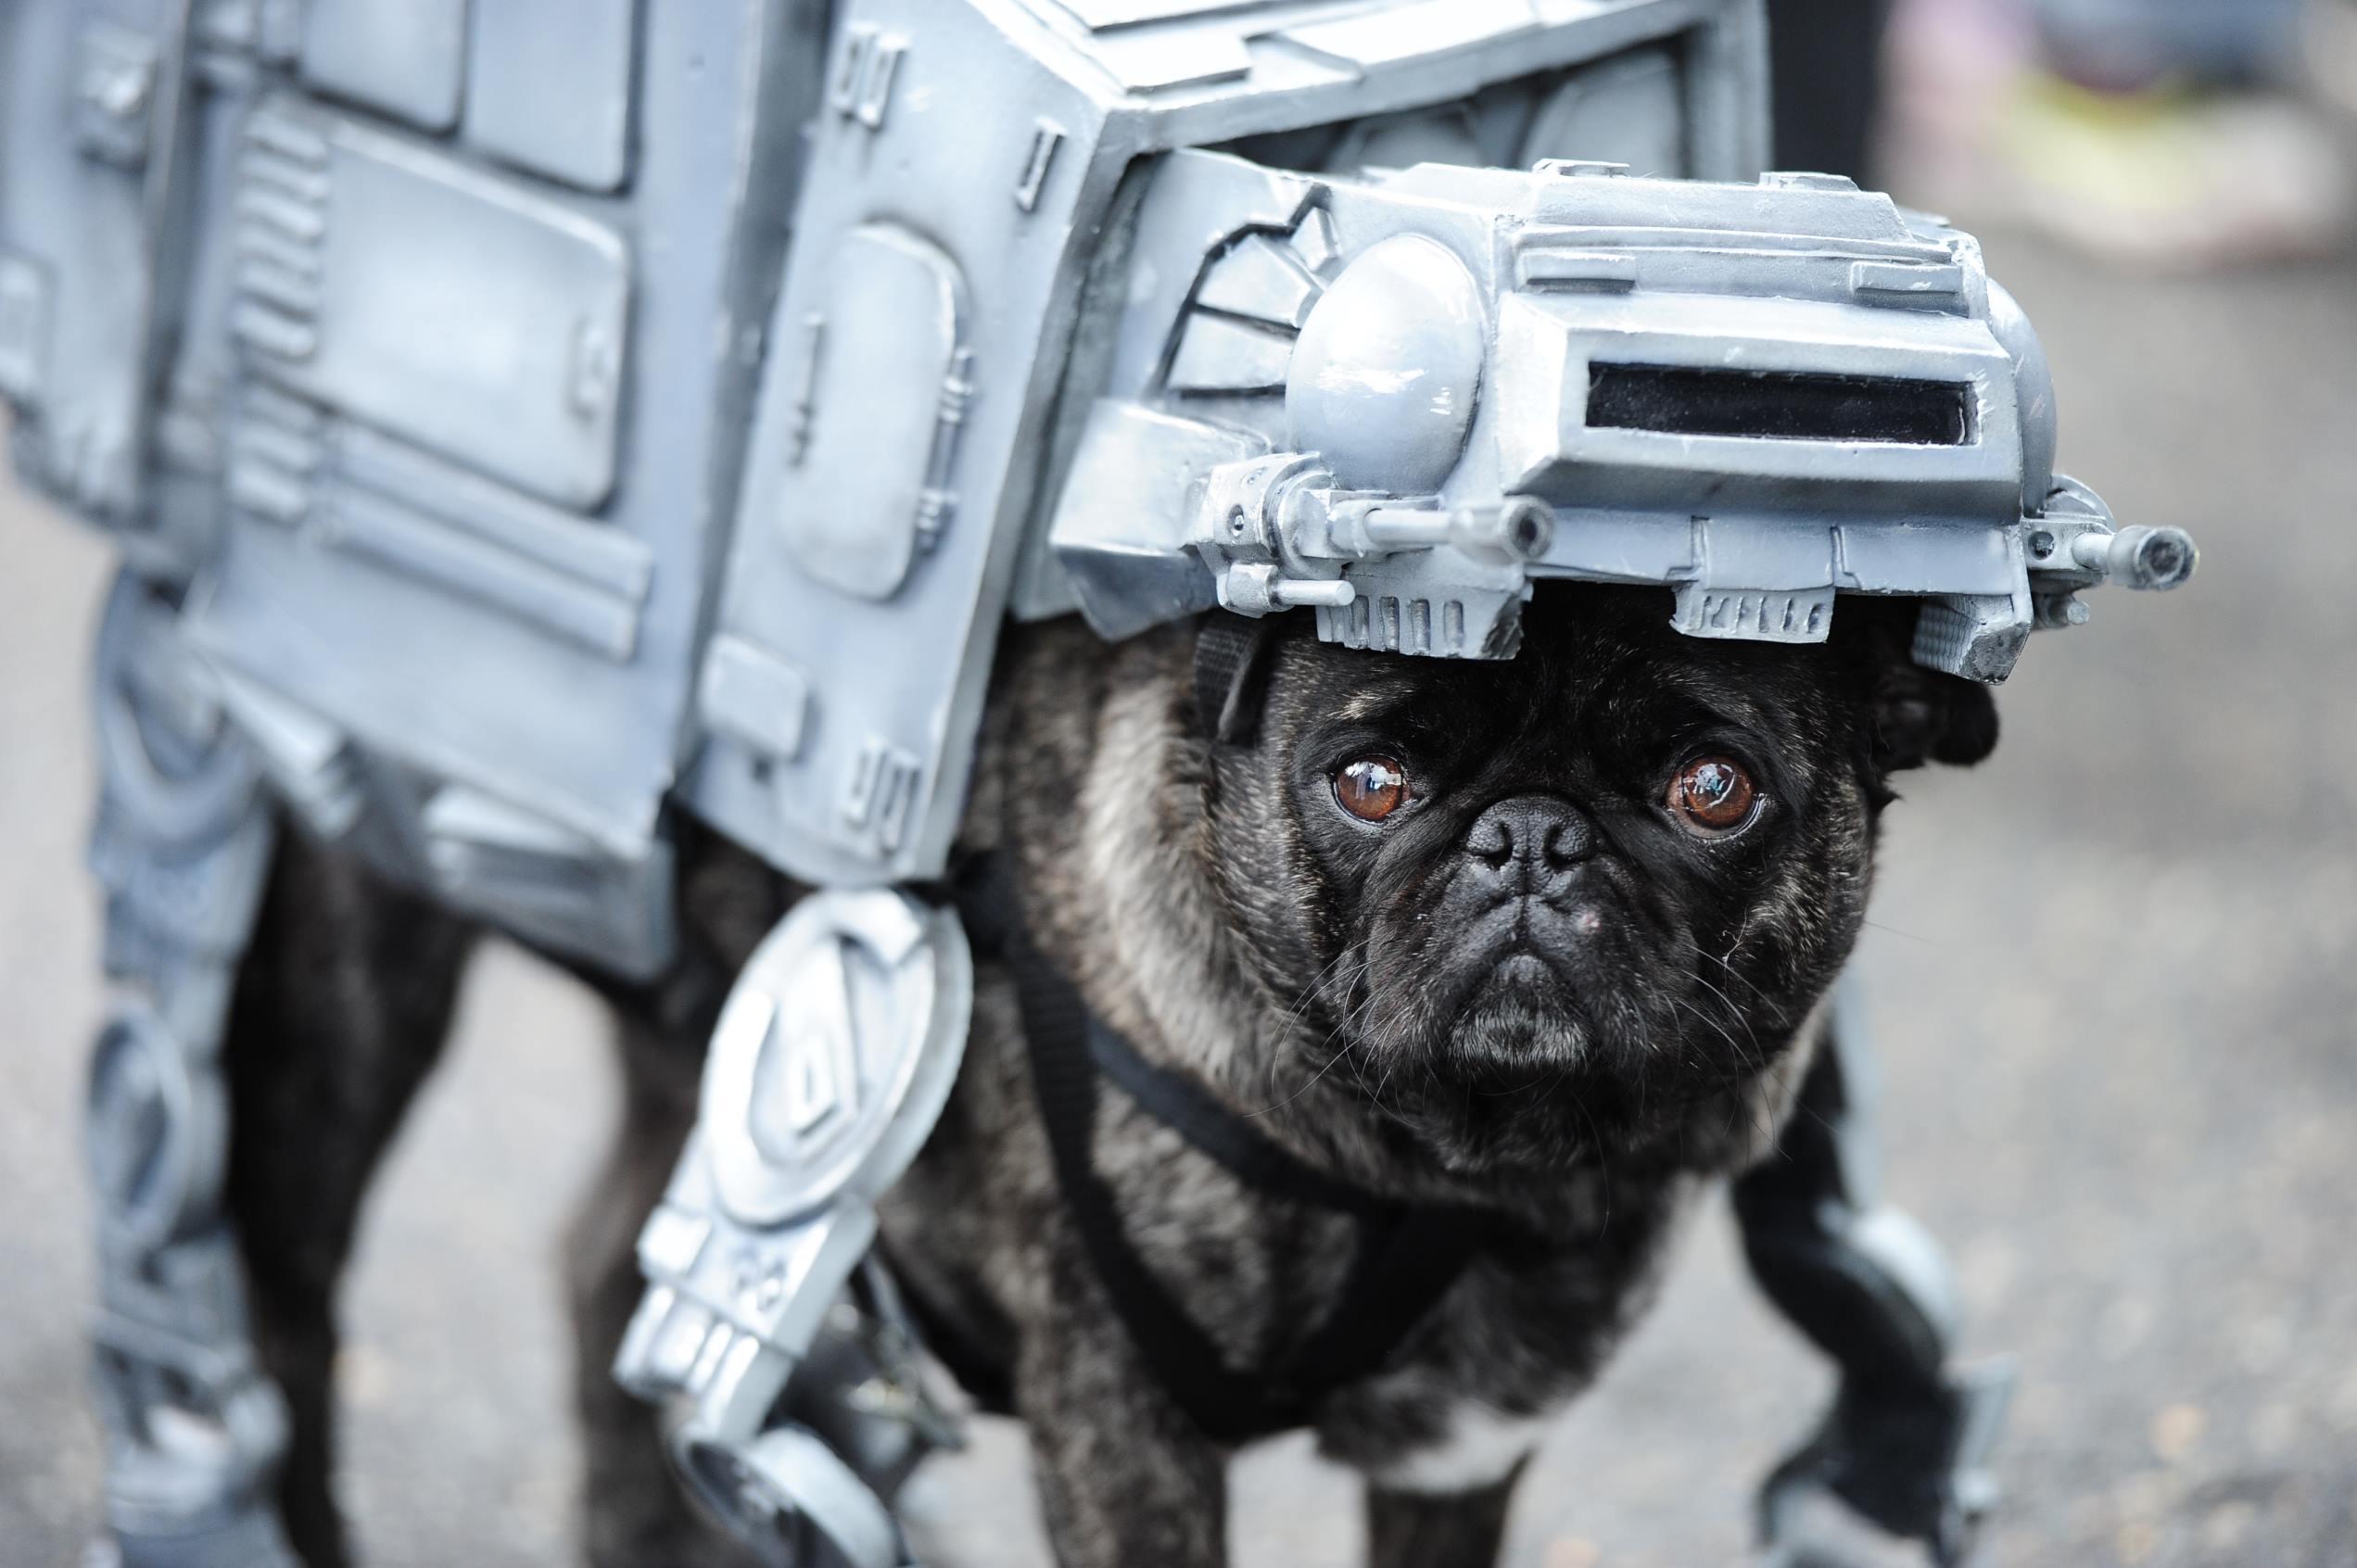 Слайд 20 из 67: Star Wars themed Pug Crawl, Portland, Oregon, America - 22 May 2016 A pug dressed as an AT-AT Walker